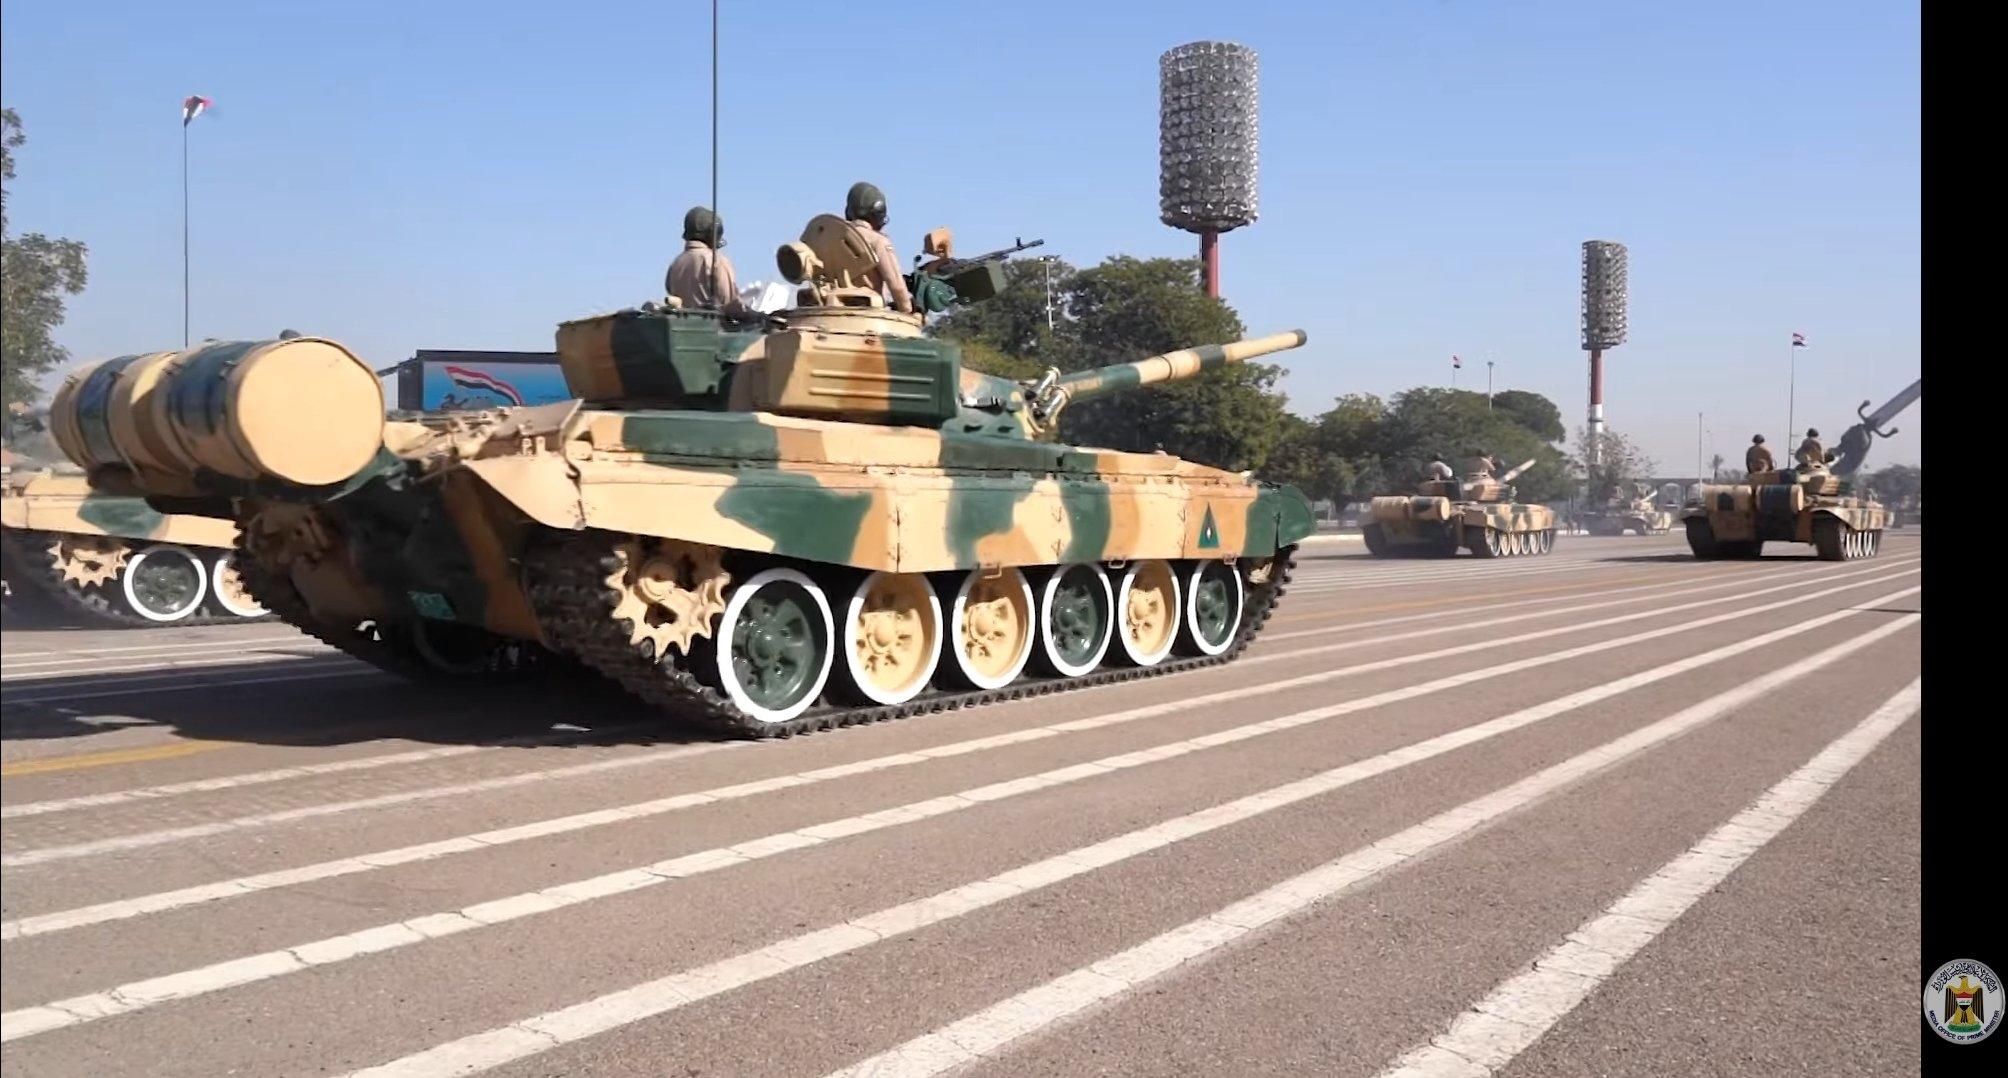 Armée Irakienne / Iraqi Armed Forces - Page 38 ErHtPc0XEAAb-O_?format=jpg&name=large